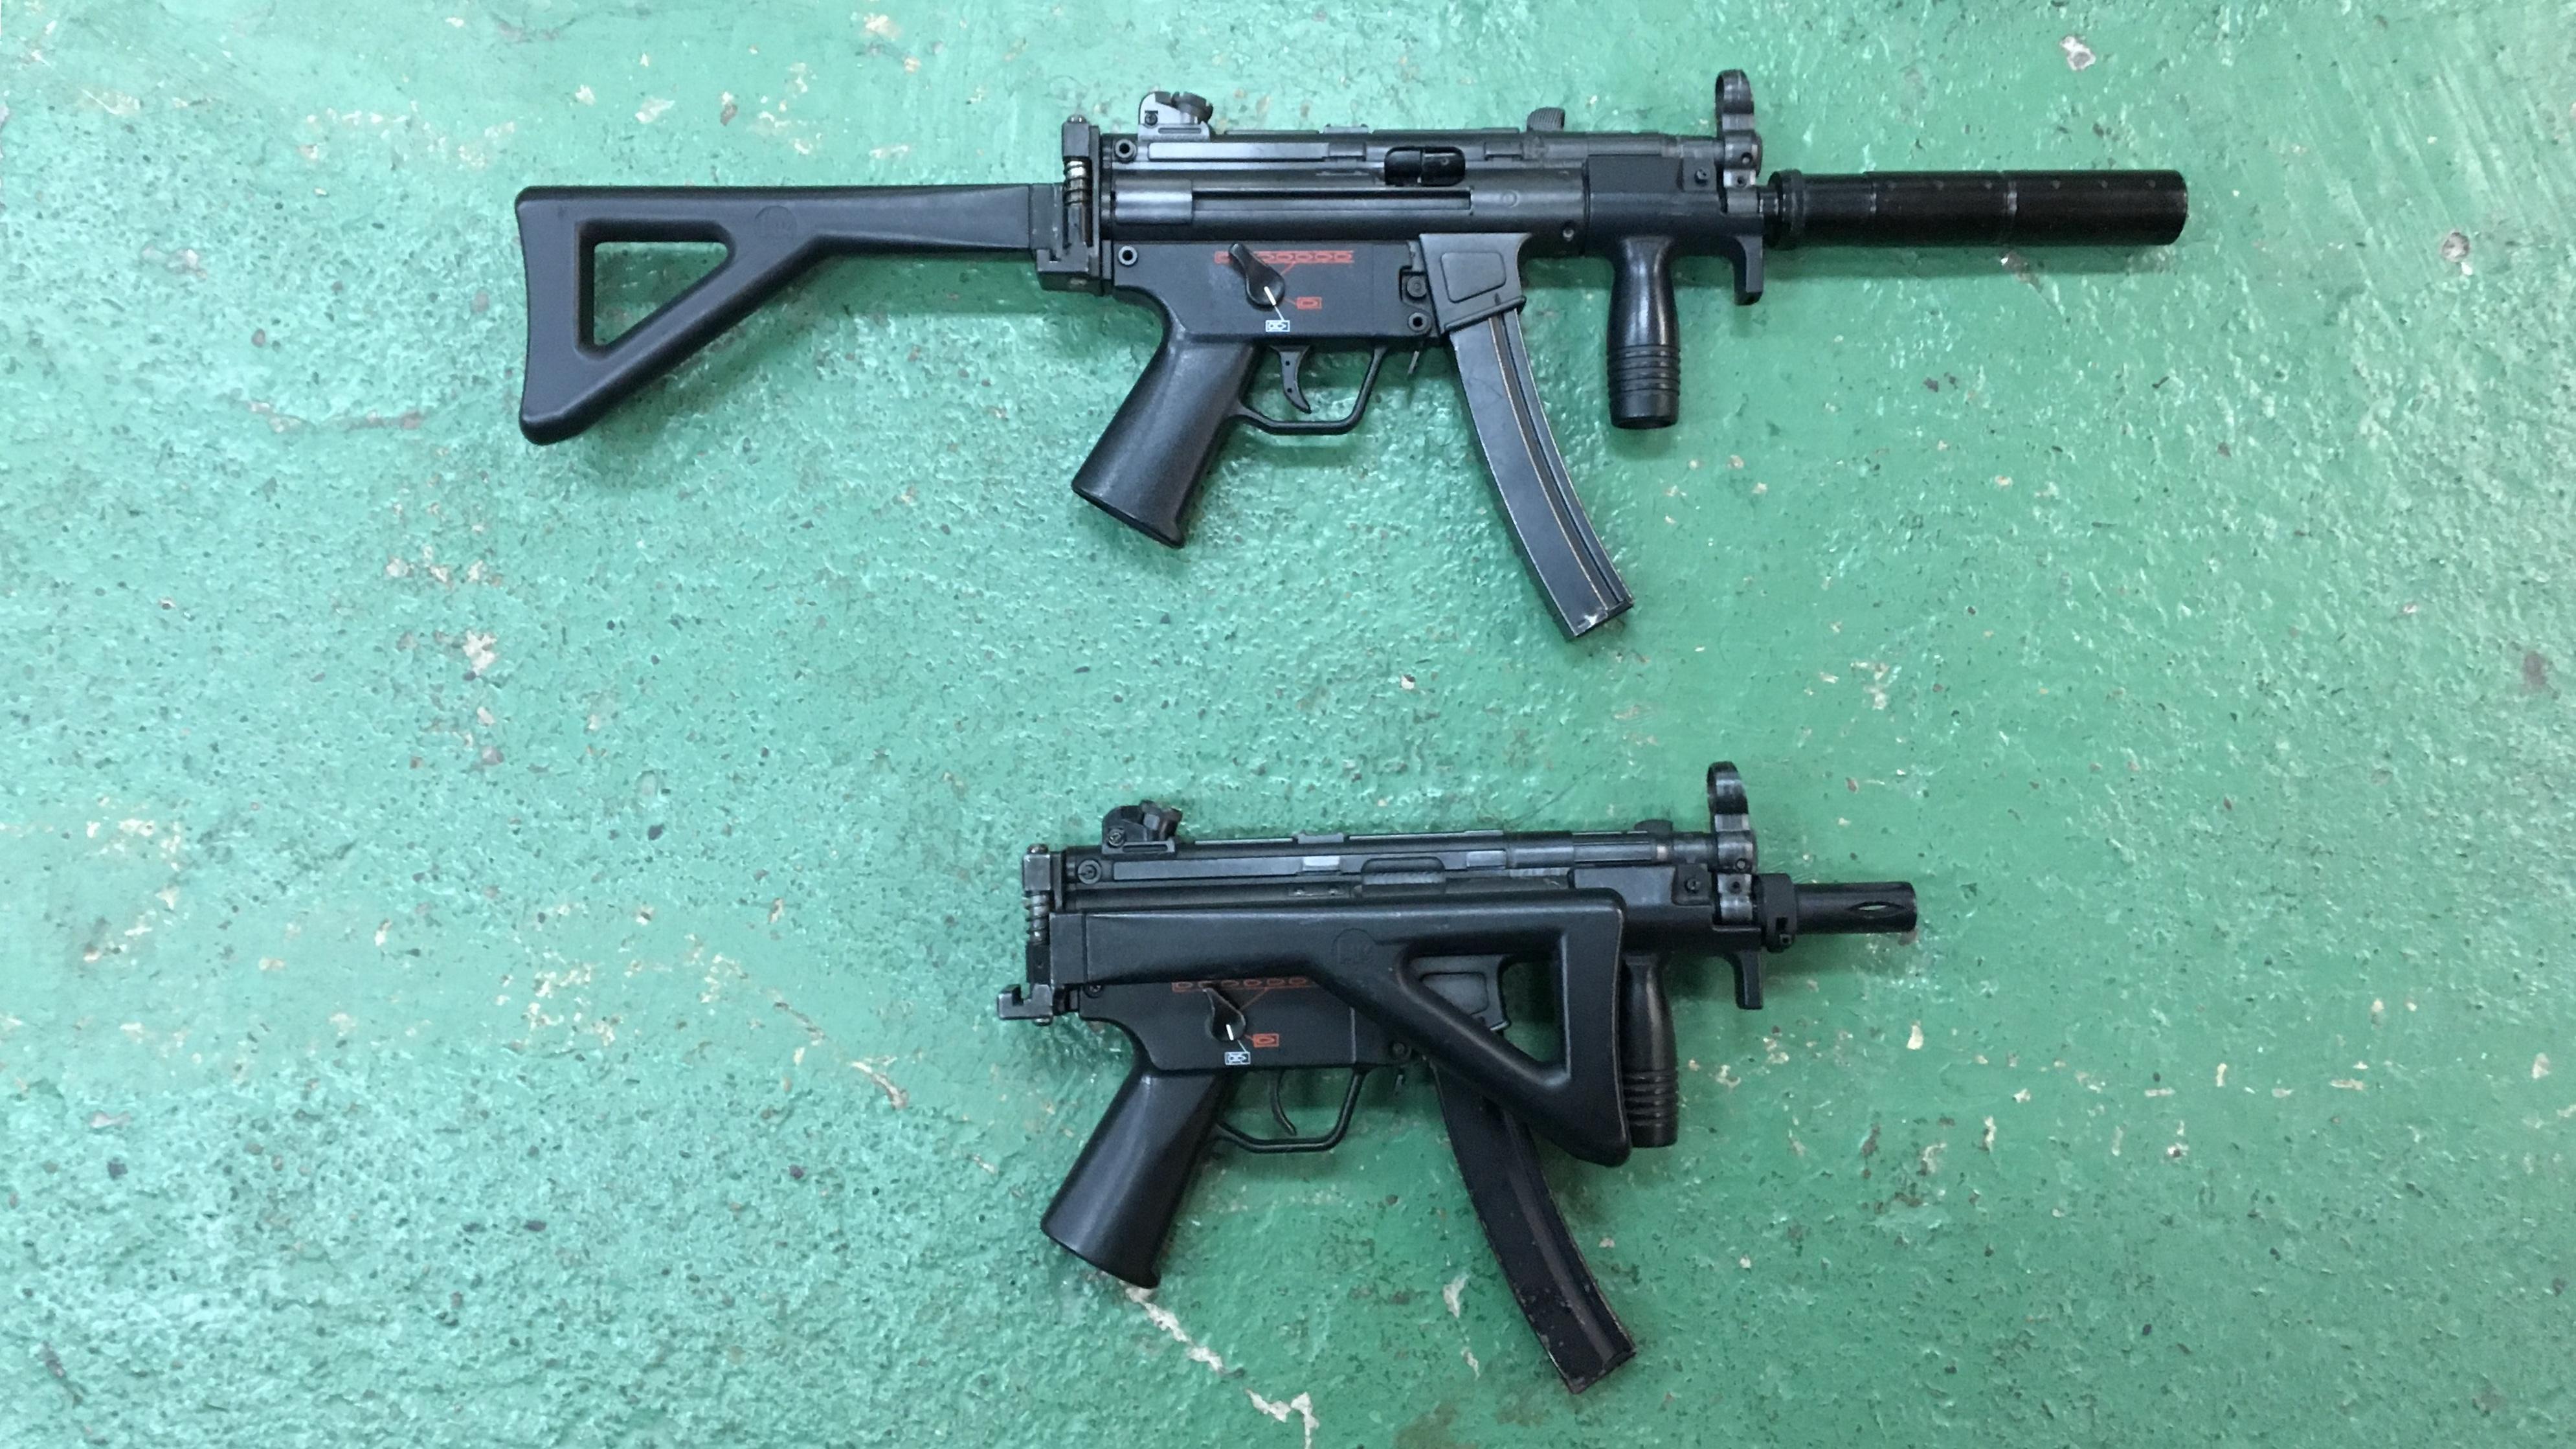 H&K MP5K PDW サブマシンガン